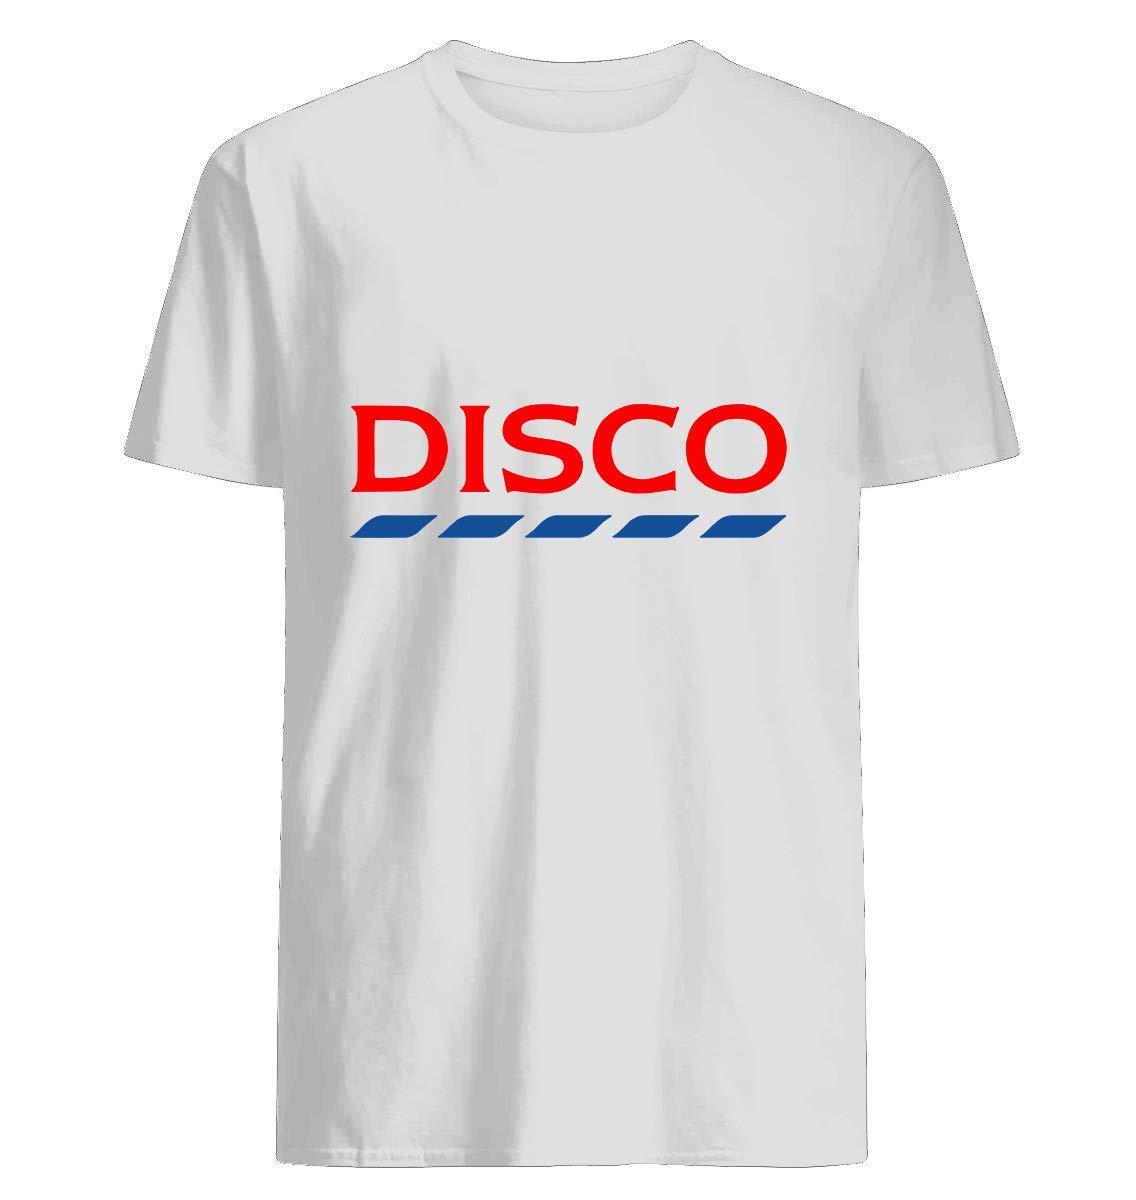 Disco Tesco 82 Shirts